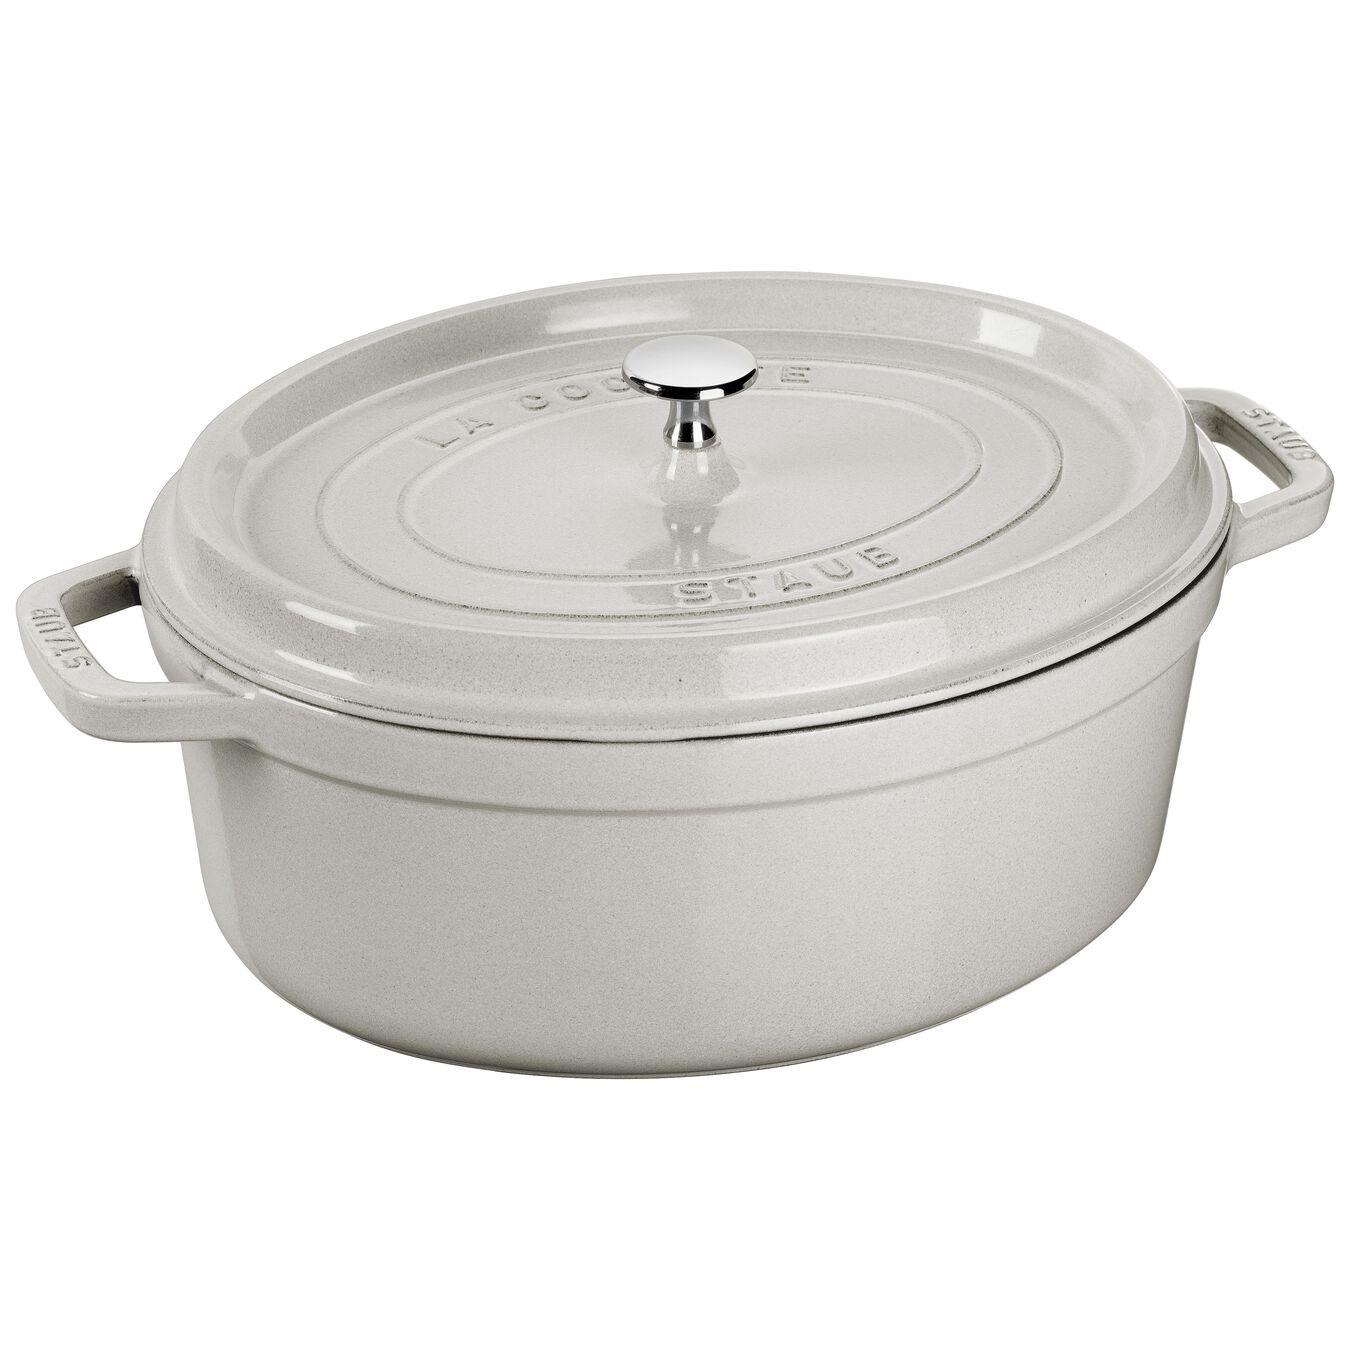 8 l Cast iron oval Cocotte, White Truffle,,large 1